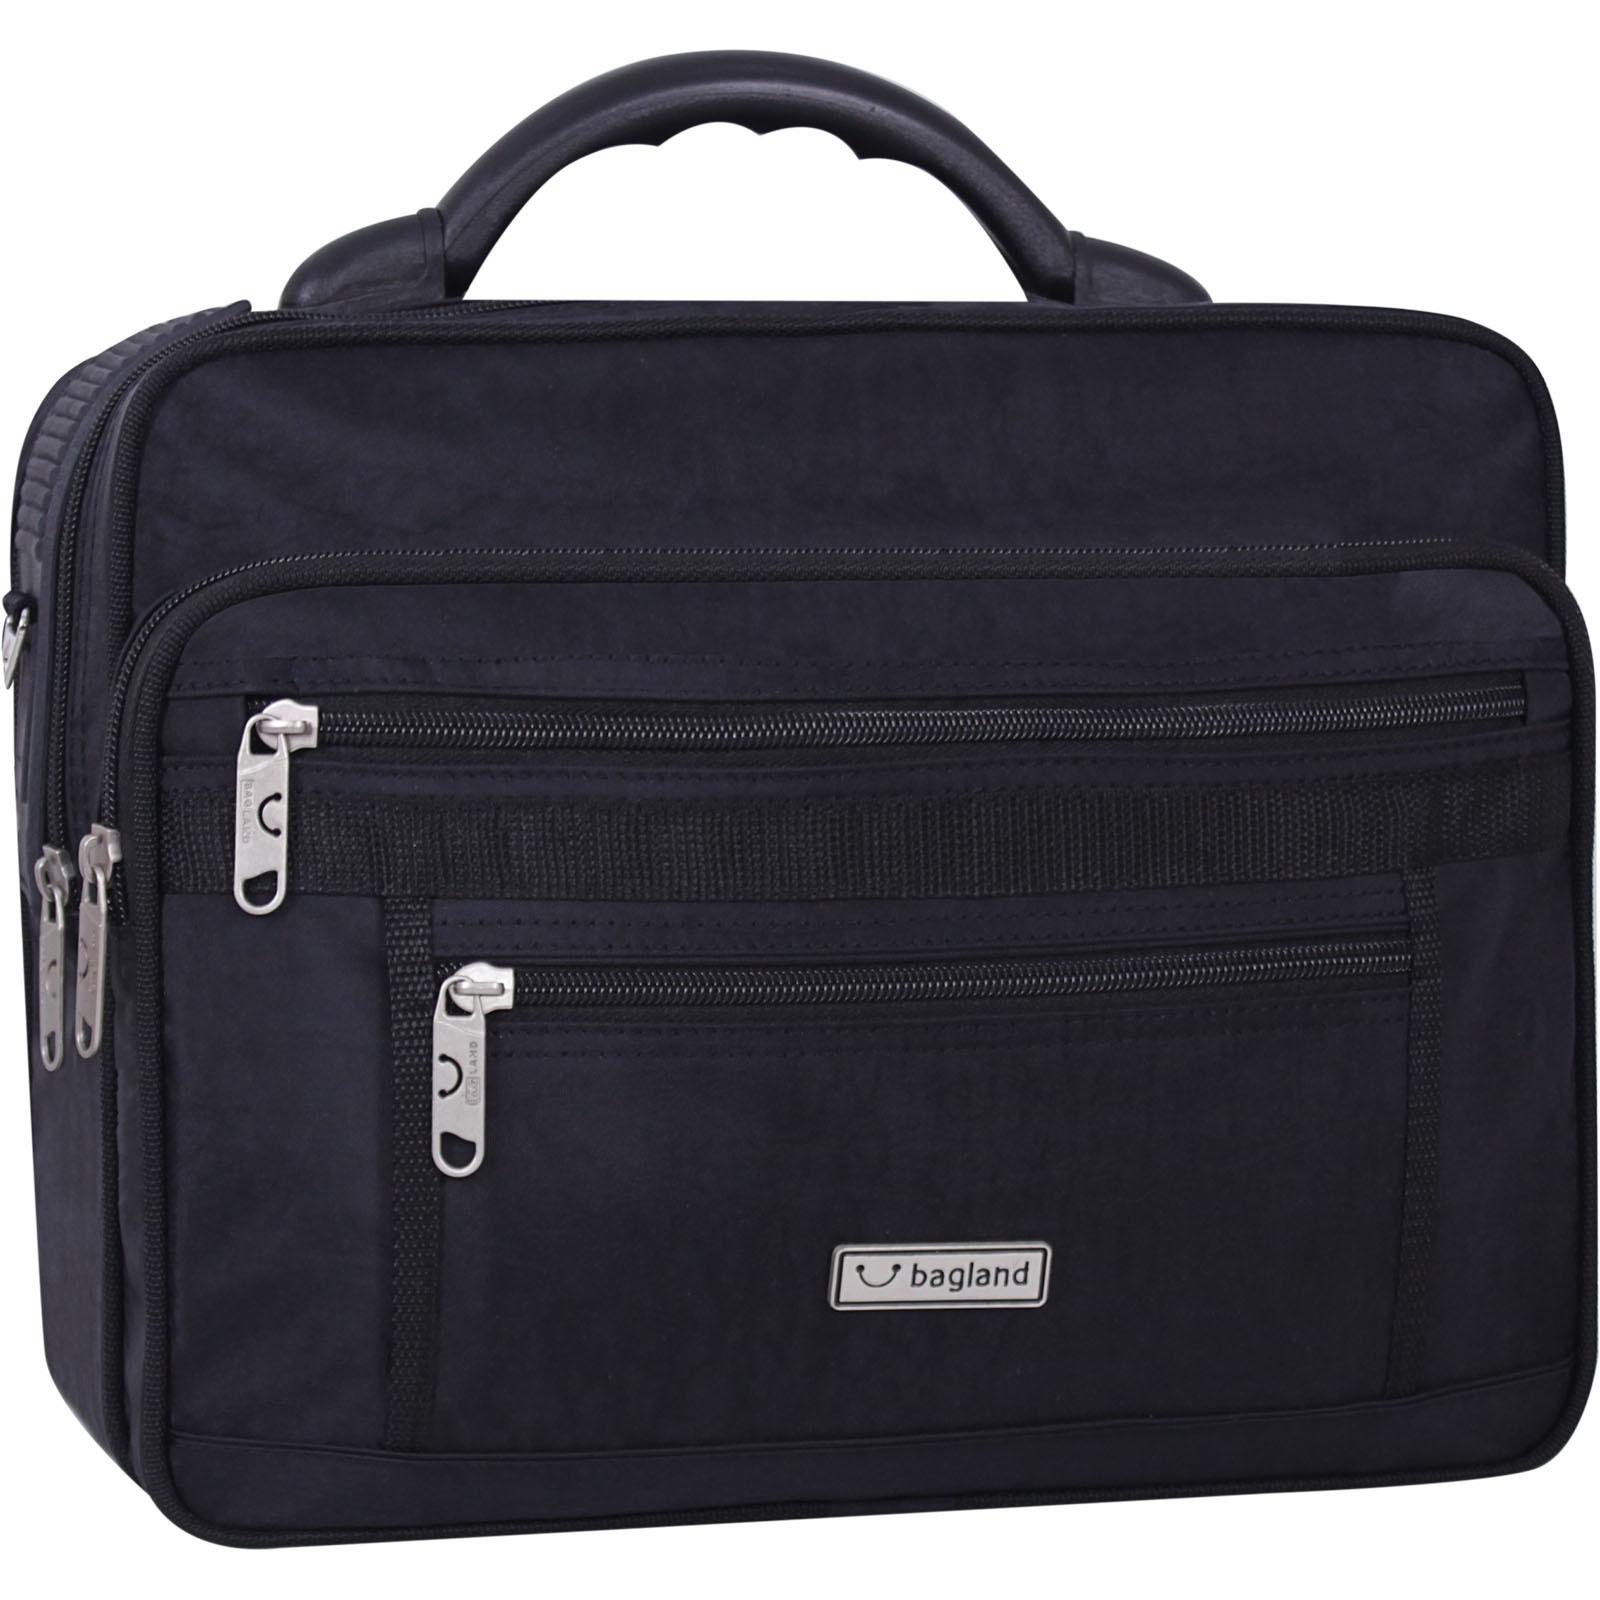 Сумки через плечо Мужская сумка Bagland Mr.Cool 15 л. Чёрный (0025170) IMG_9113-1600.jpg